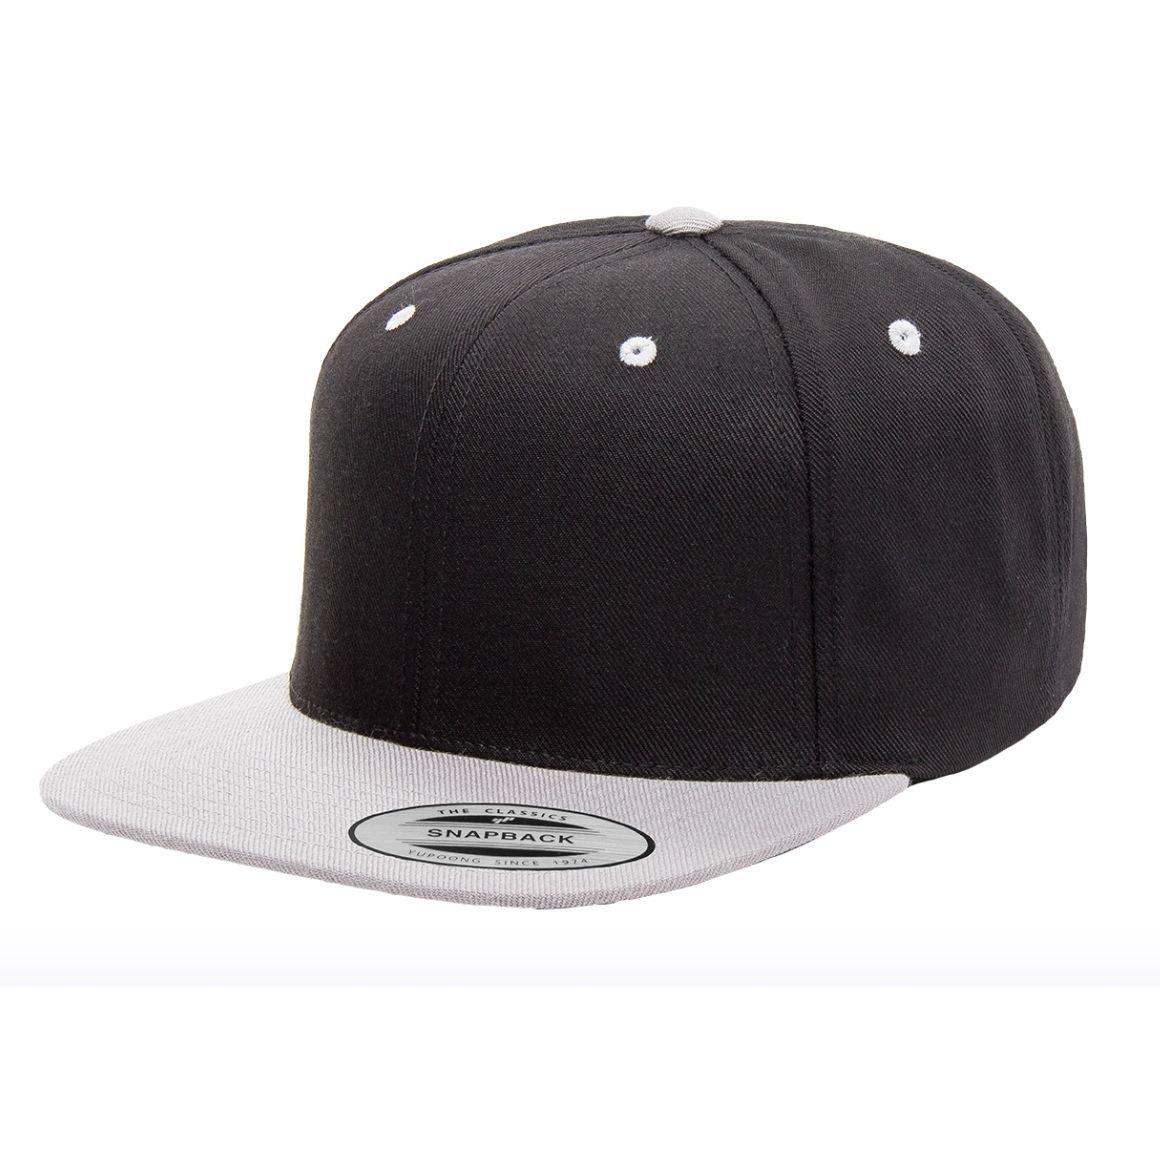 Yupoong Flexfit 6089MT Classic 2 Tone Snapback Baseball Blank Plain Hat Cap